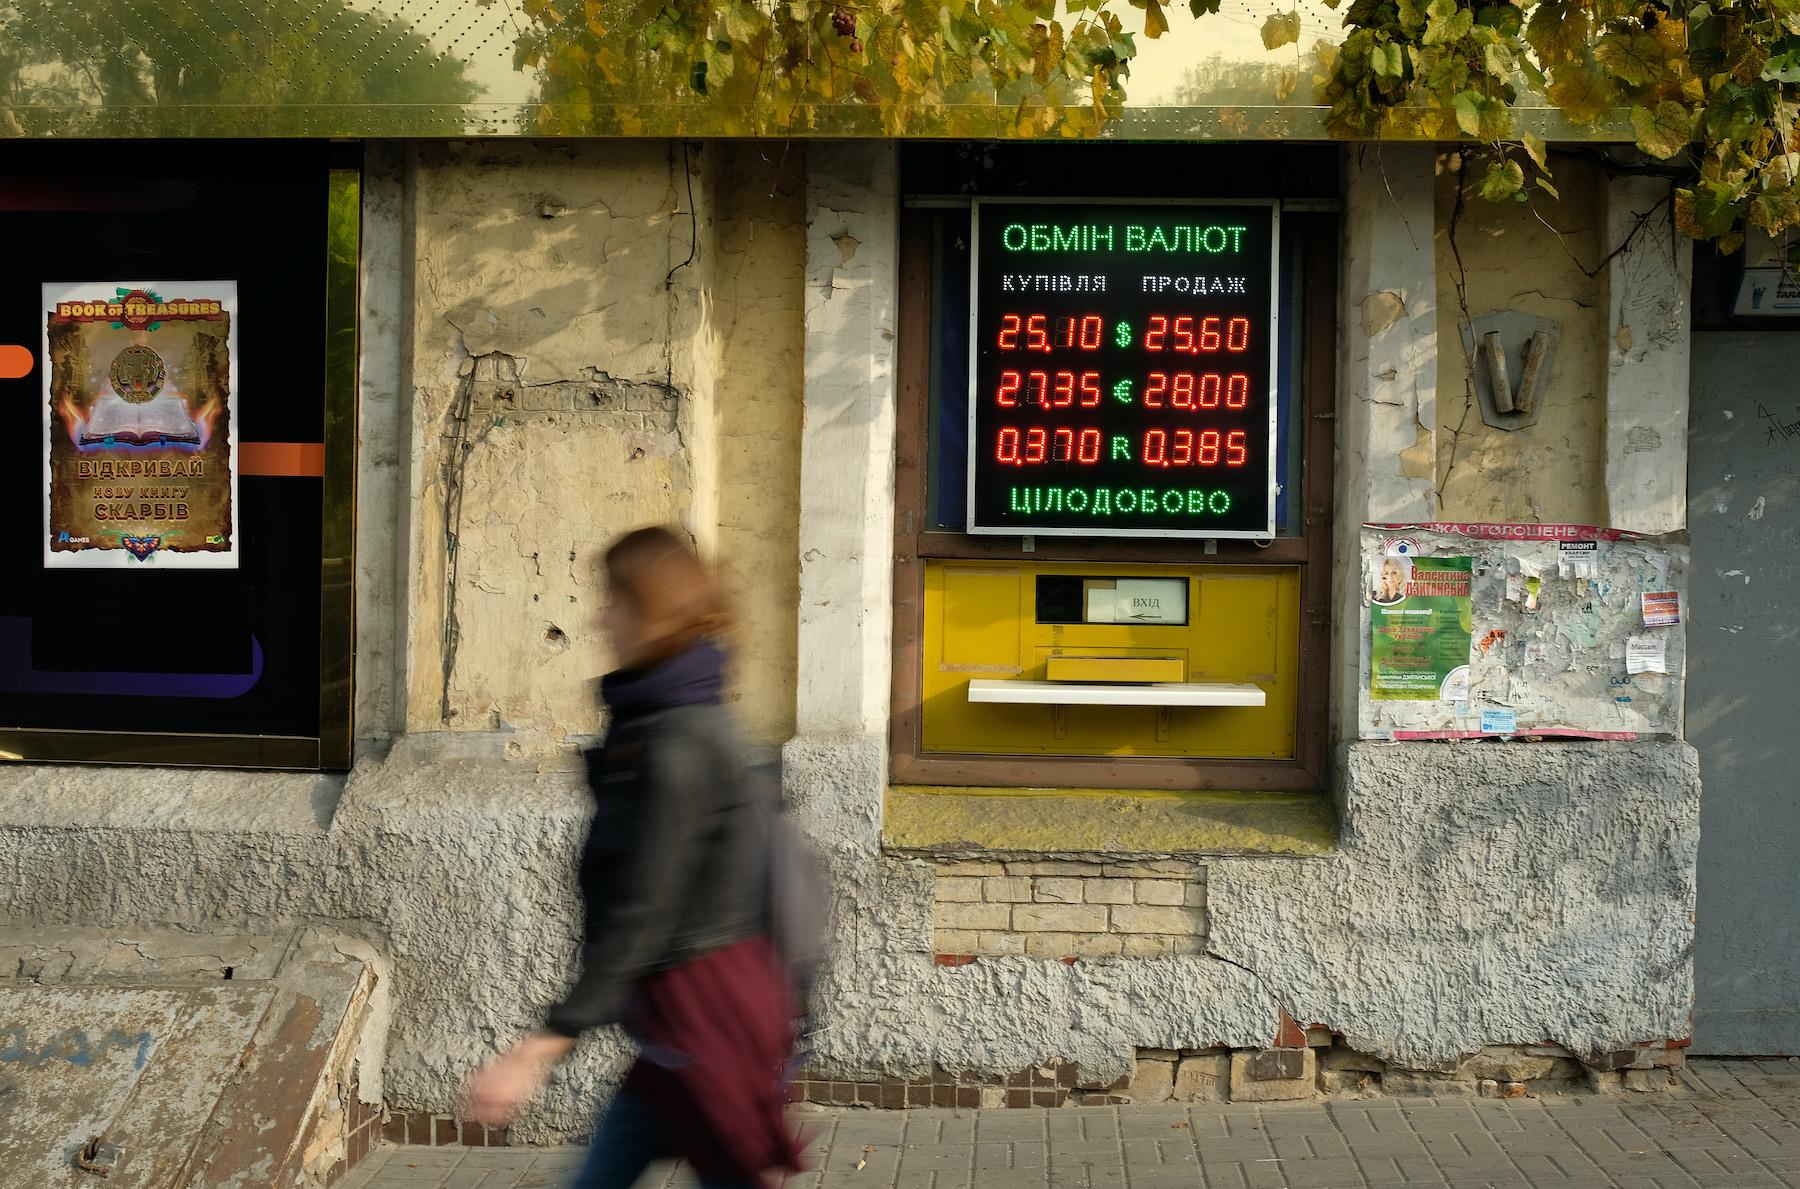 An illuminated sign advertises exchange rates